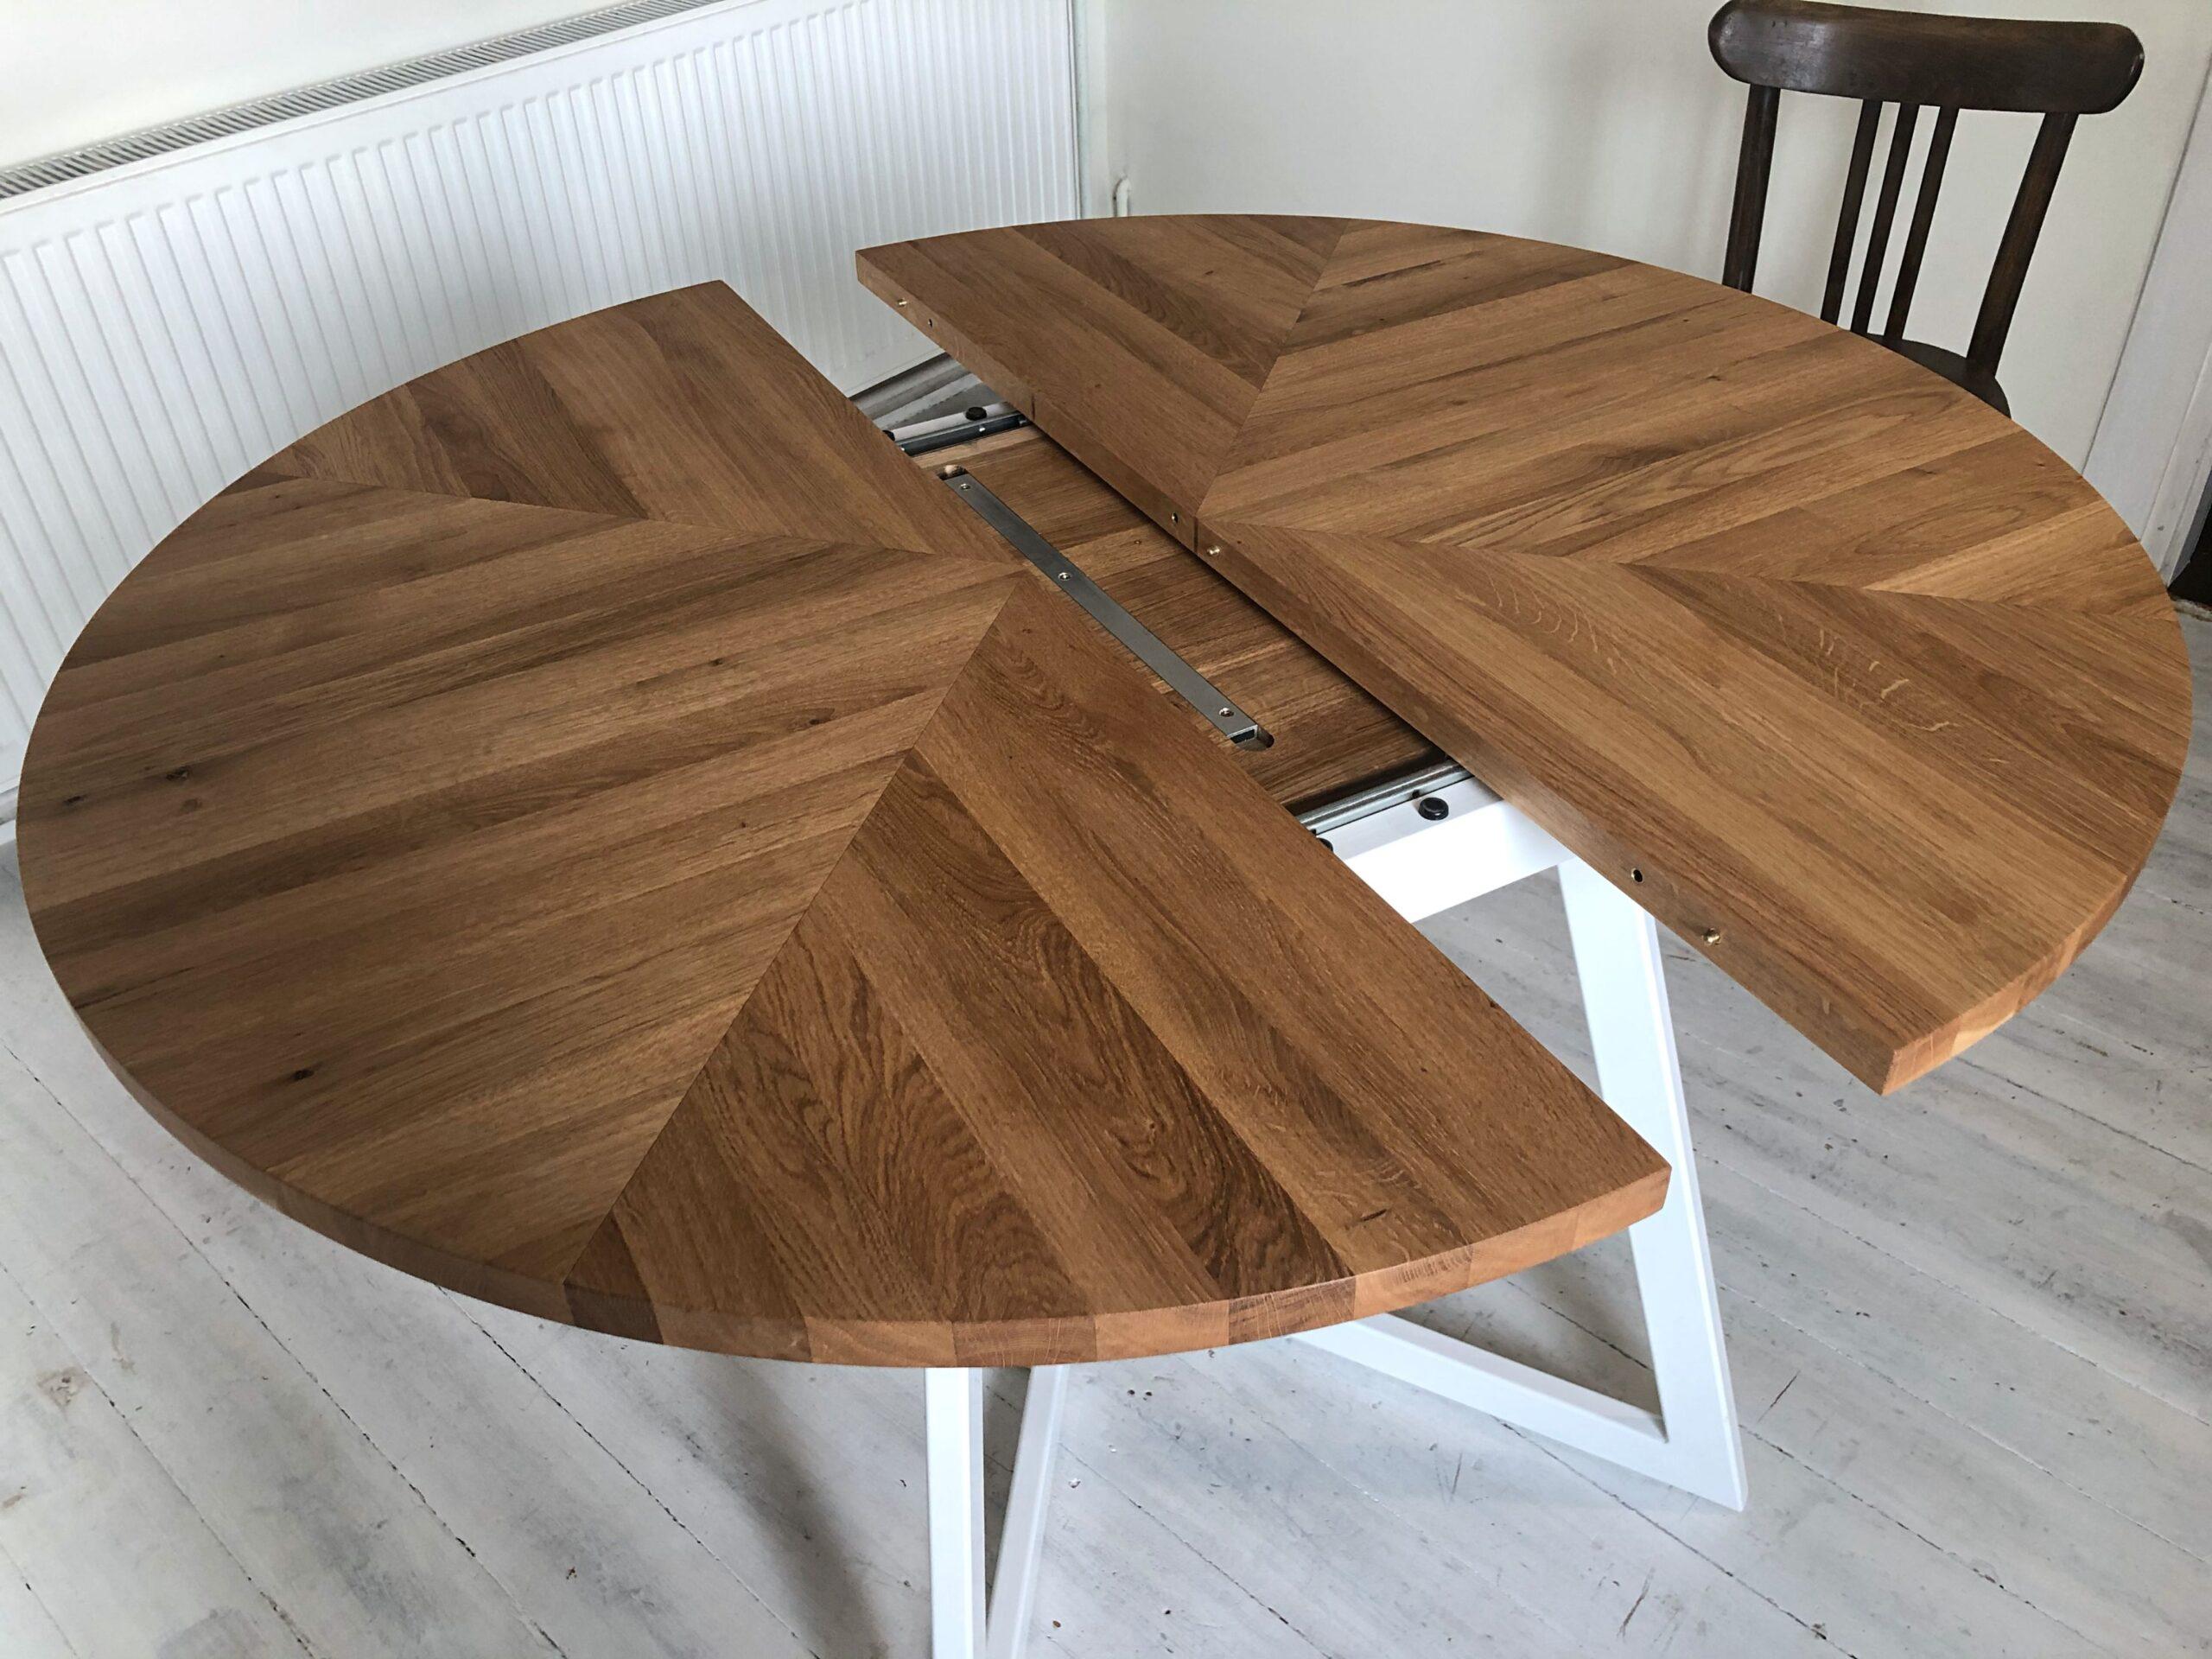 6 round oak table